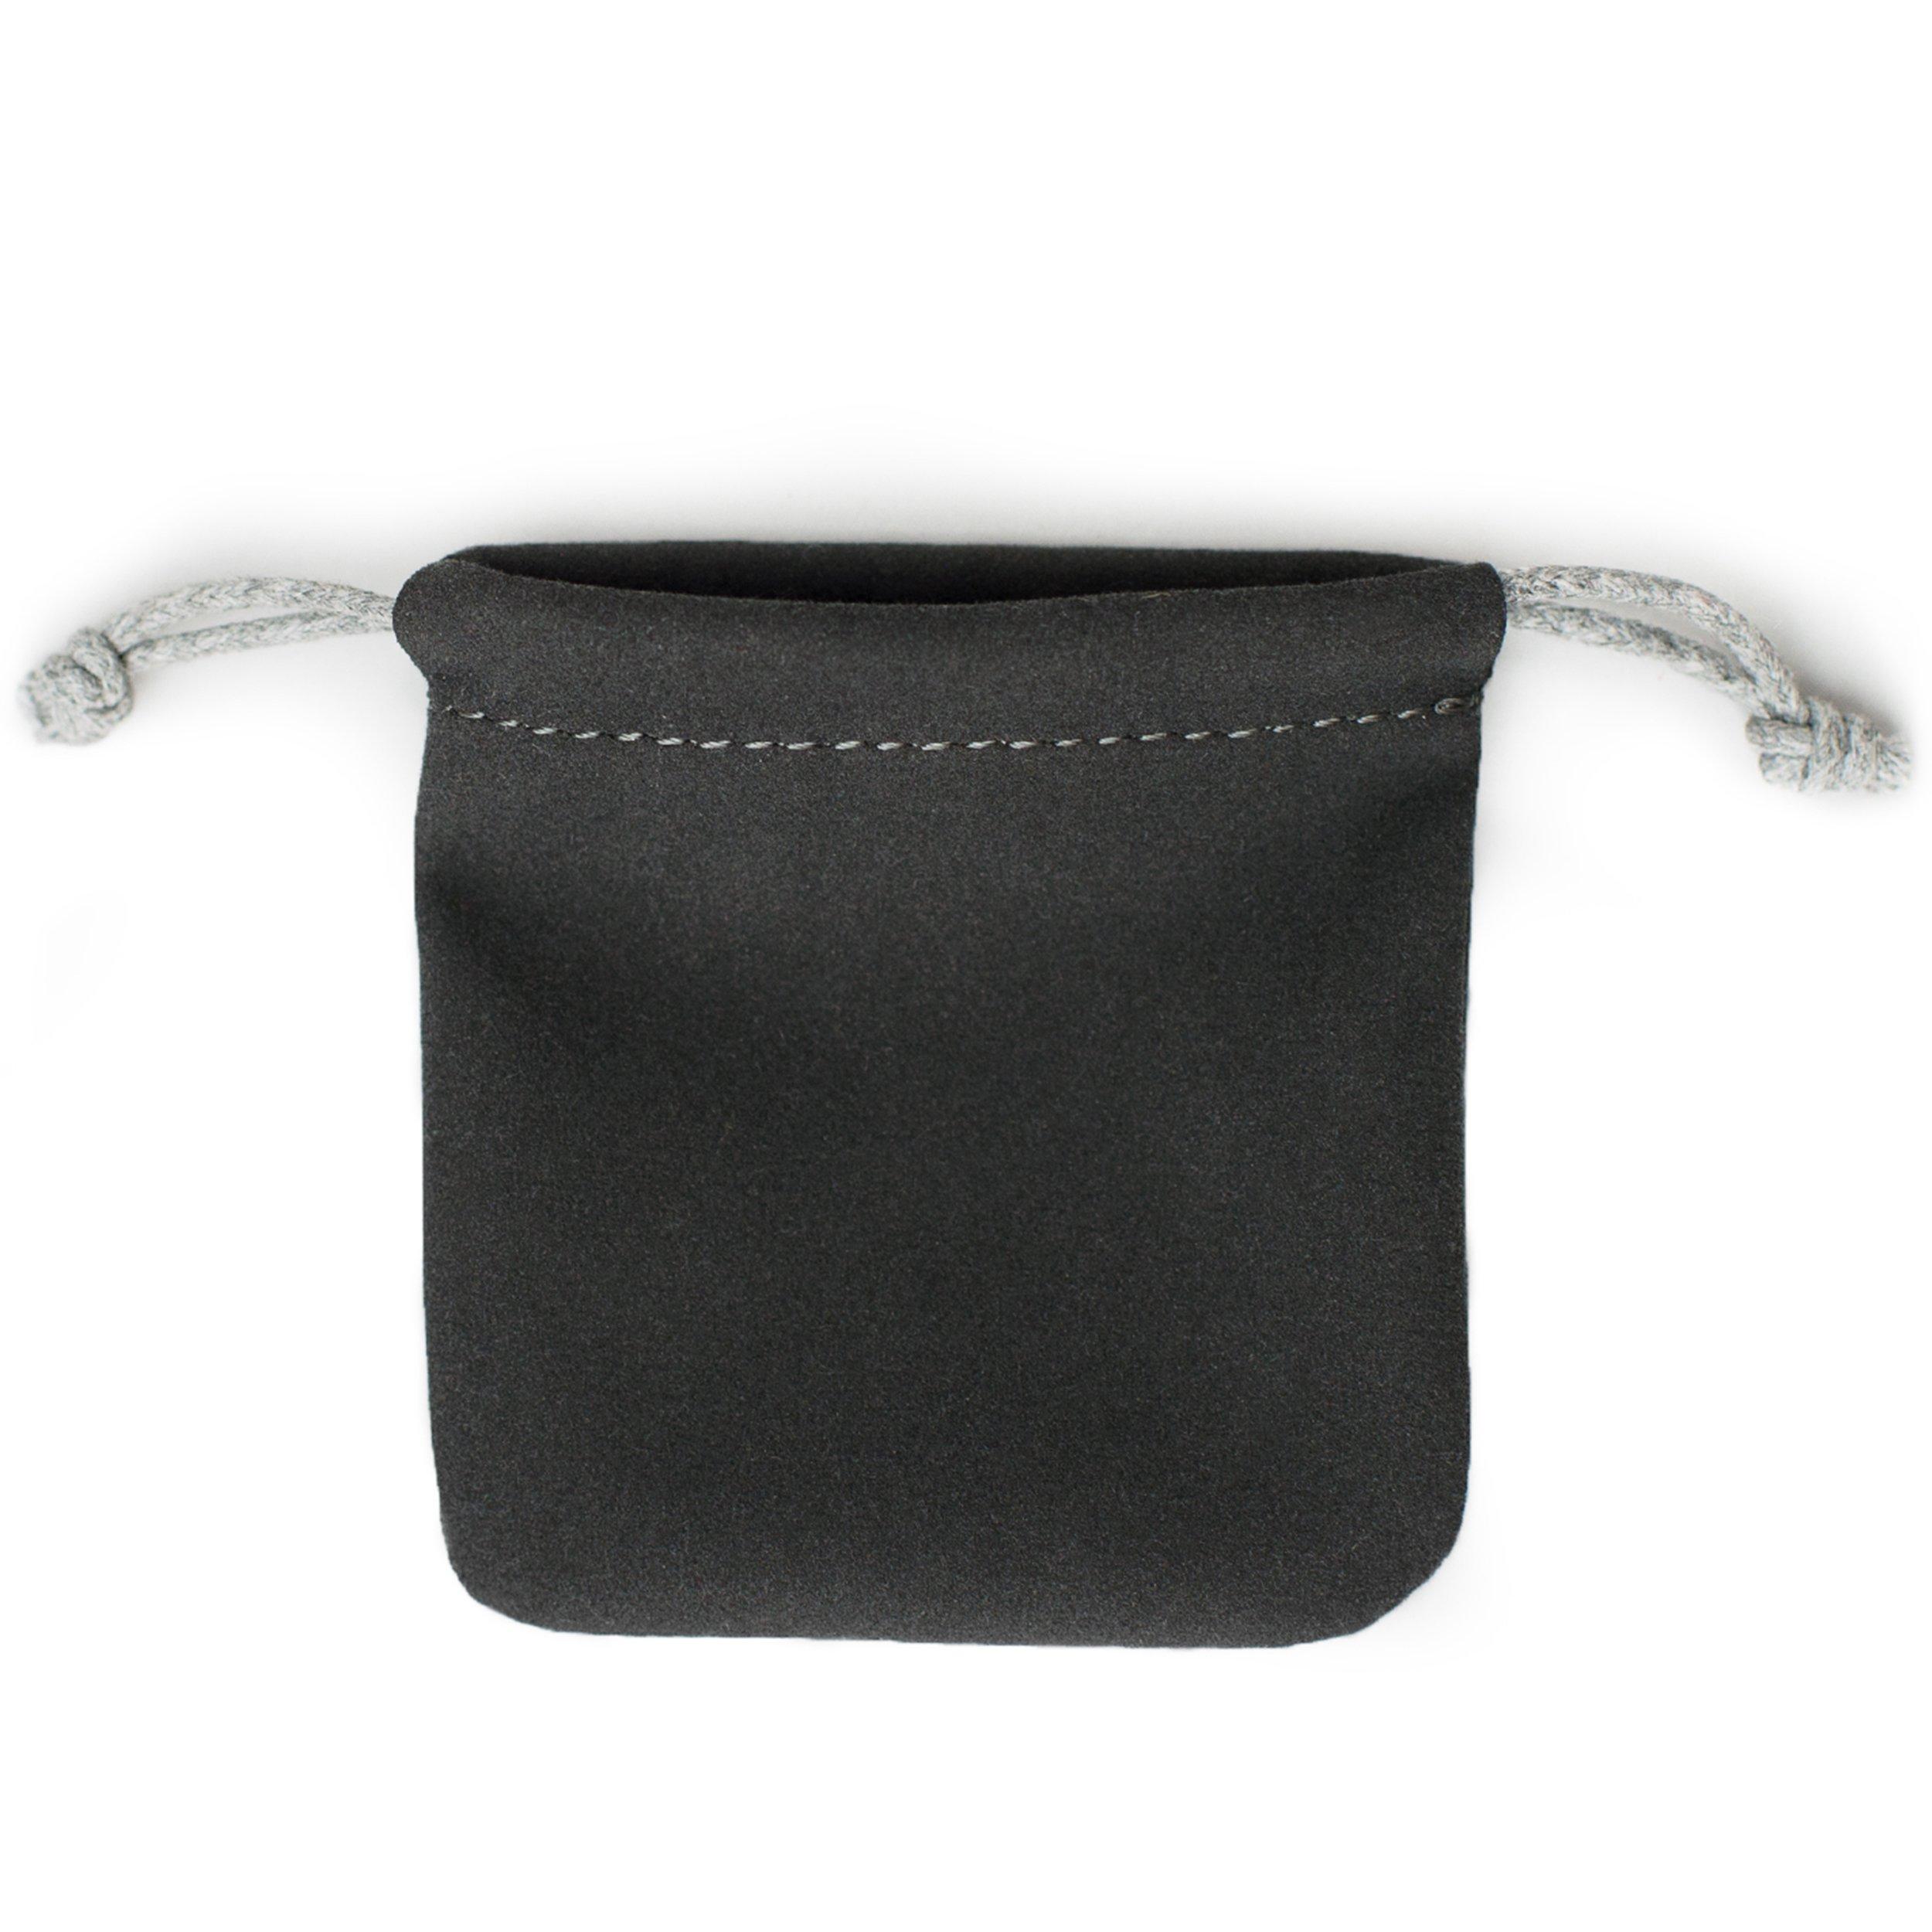 ویکالا · خرید  اصل اورجینال · خرید از آمازون · Moment - Single Lens Microfiber Bag wekala · ویکالا